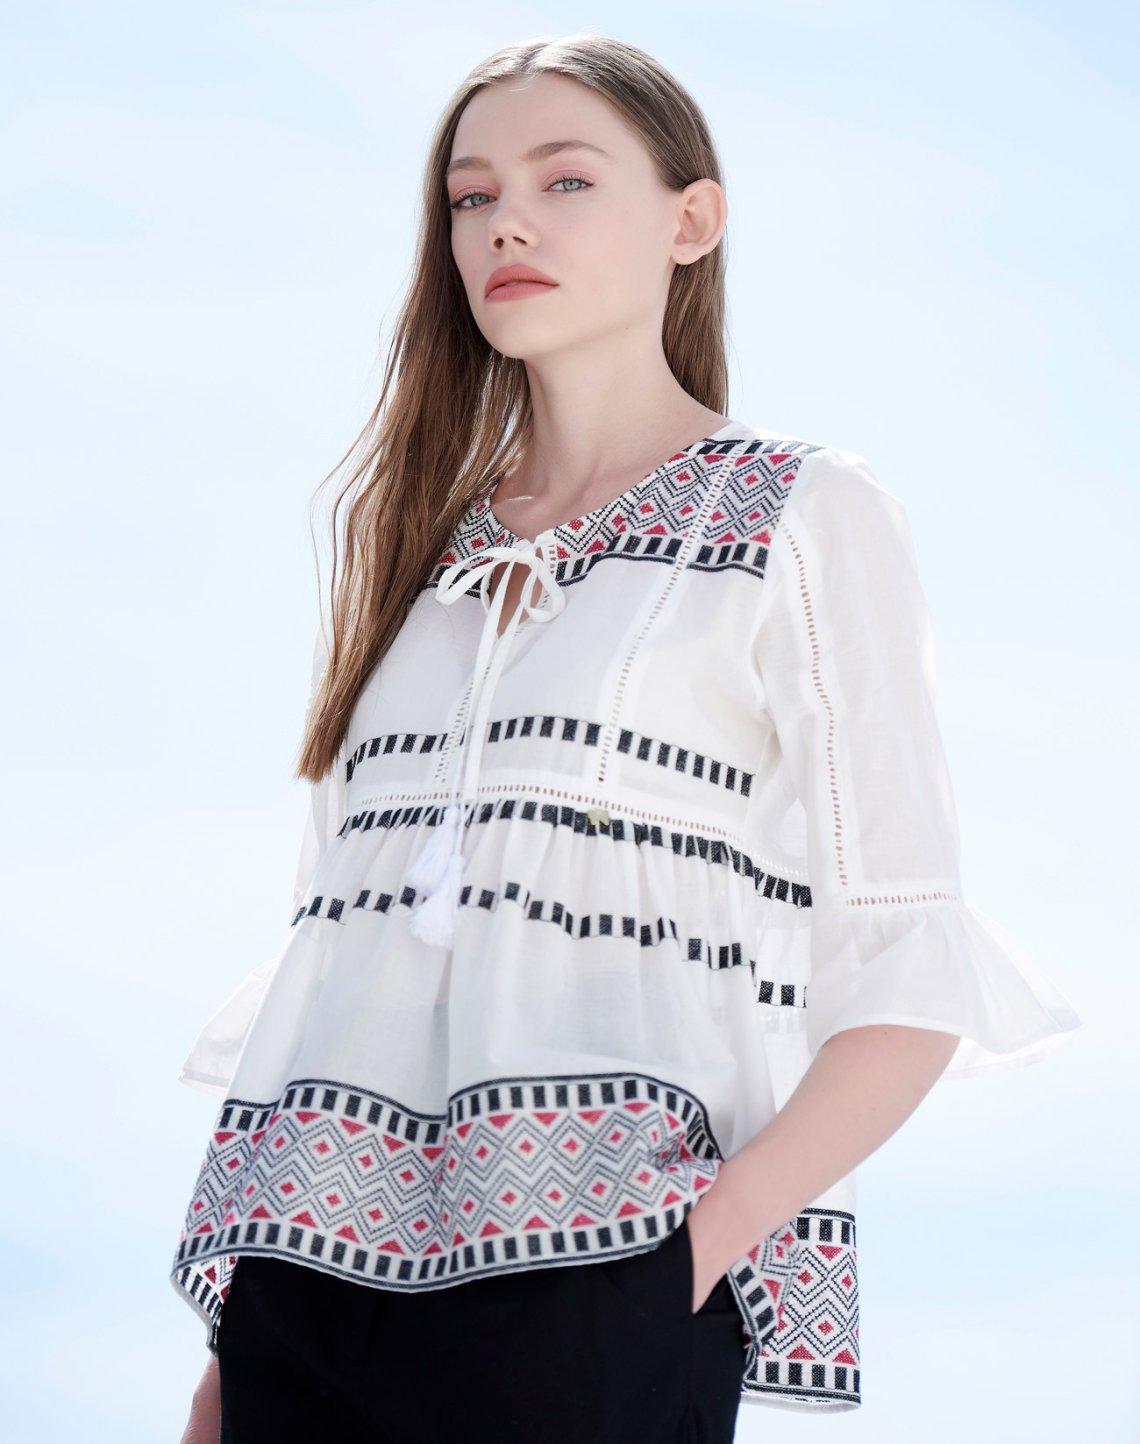 Boho style μπλούζα